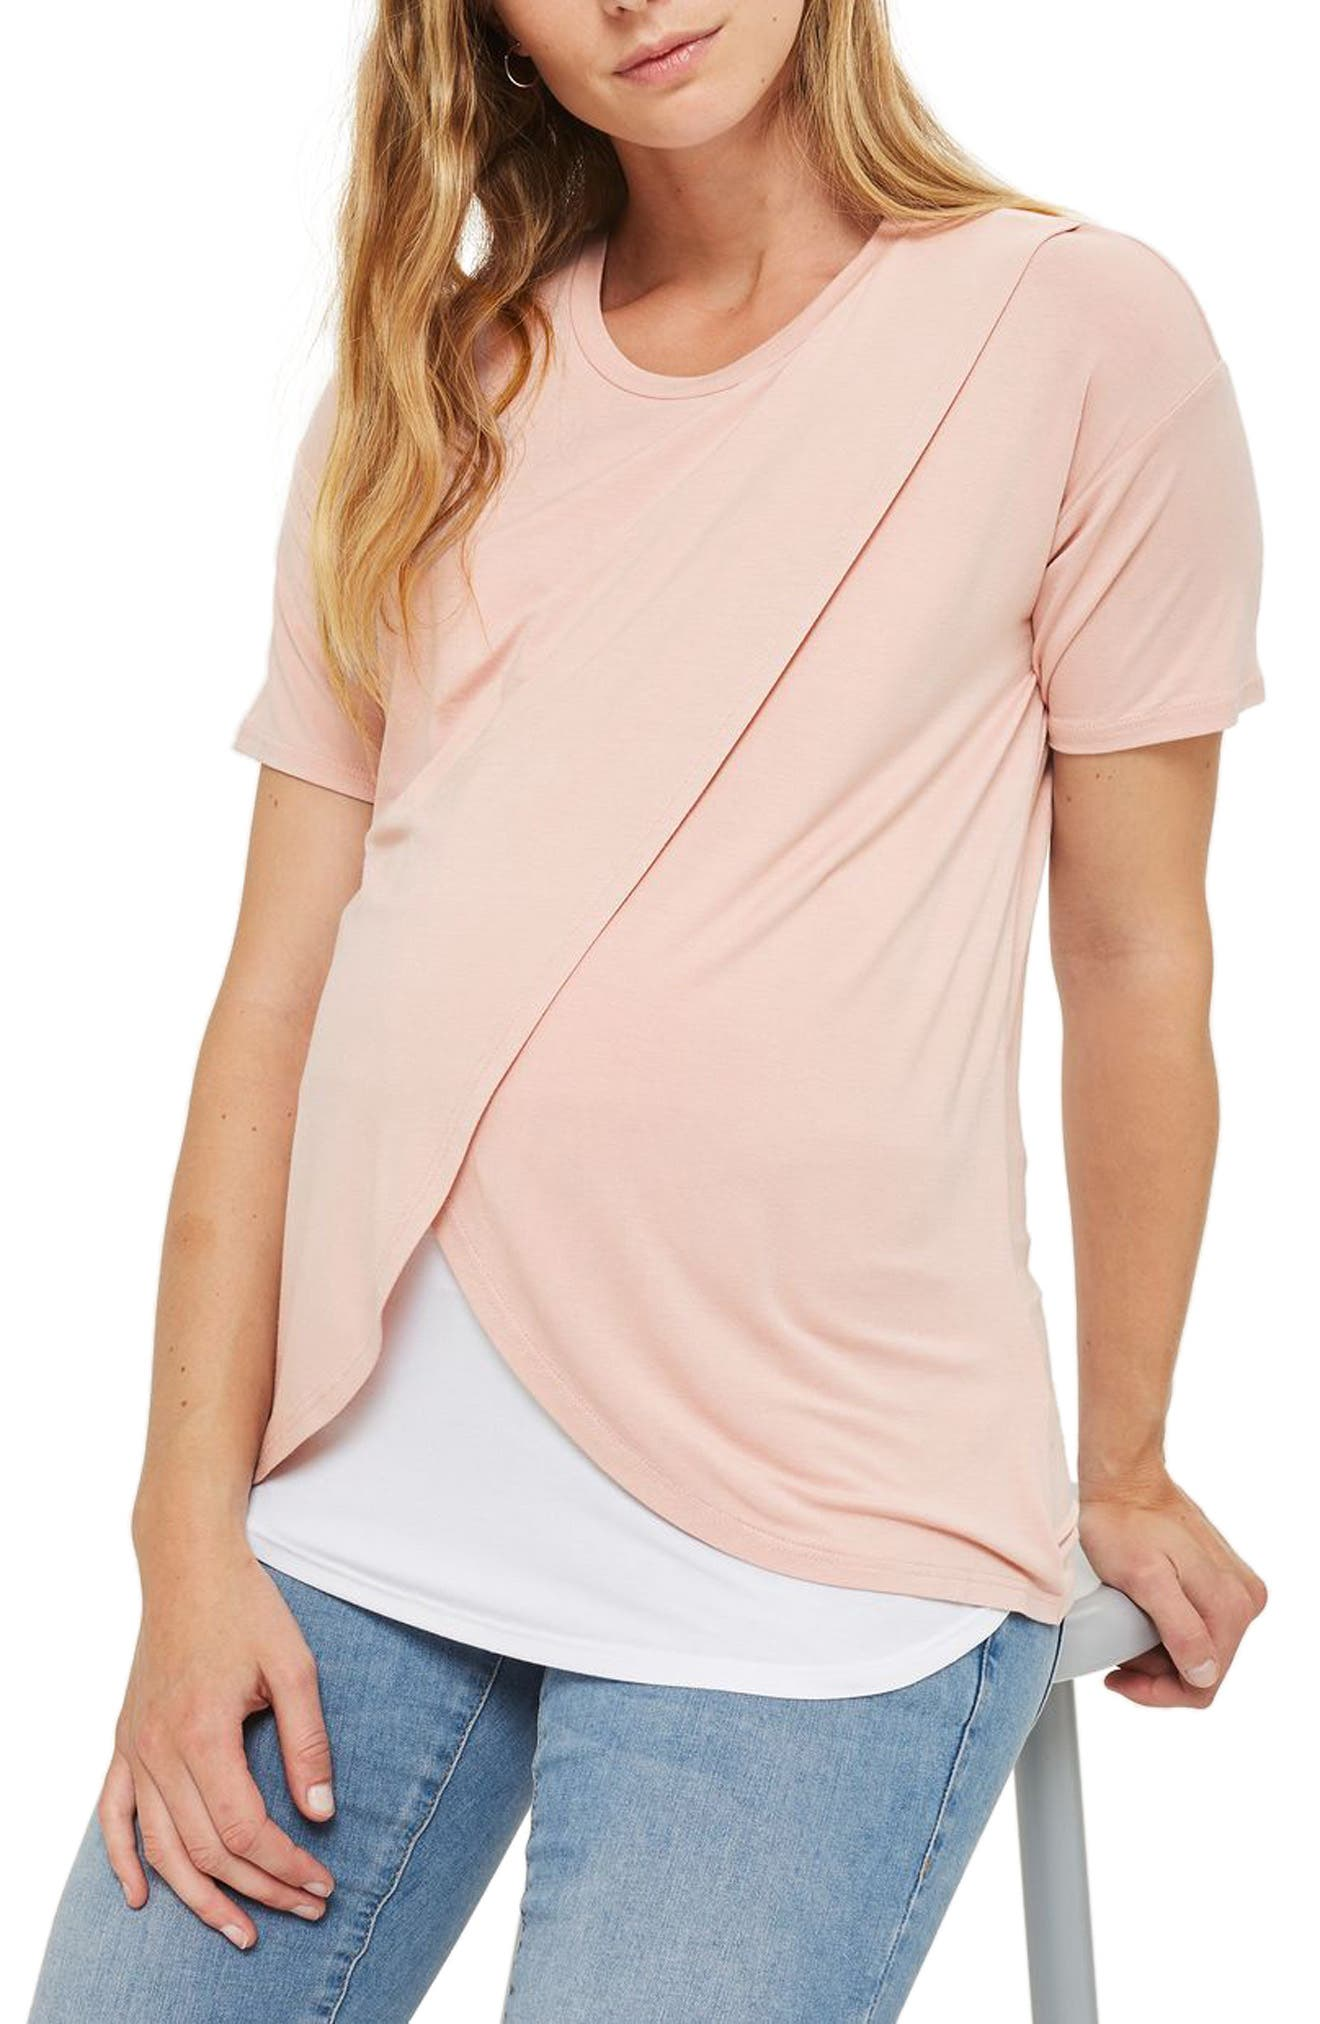 Topshop Short Sleeve Drape Maternity/Nursing Tee